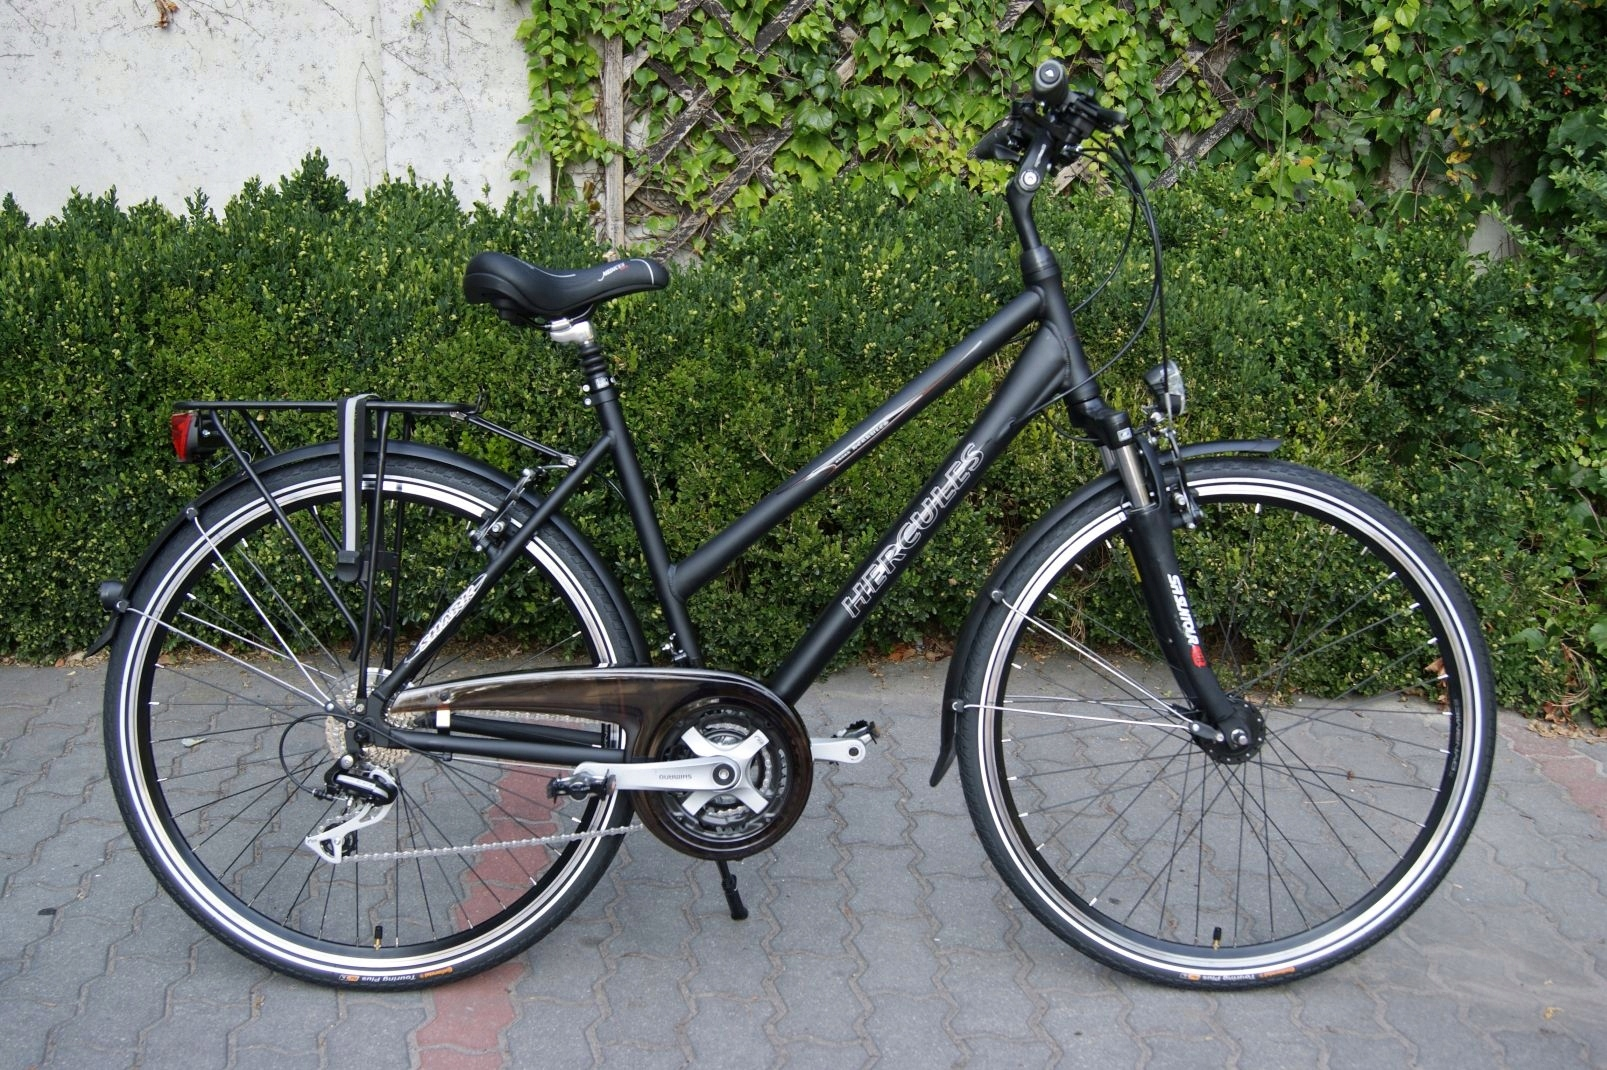 NOWY aluminiowy rower trekking Hercules 28''koła